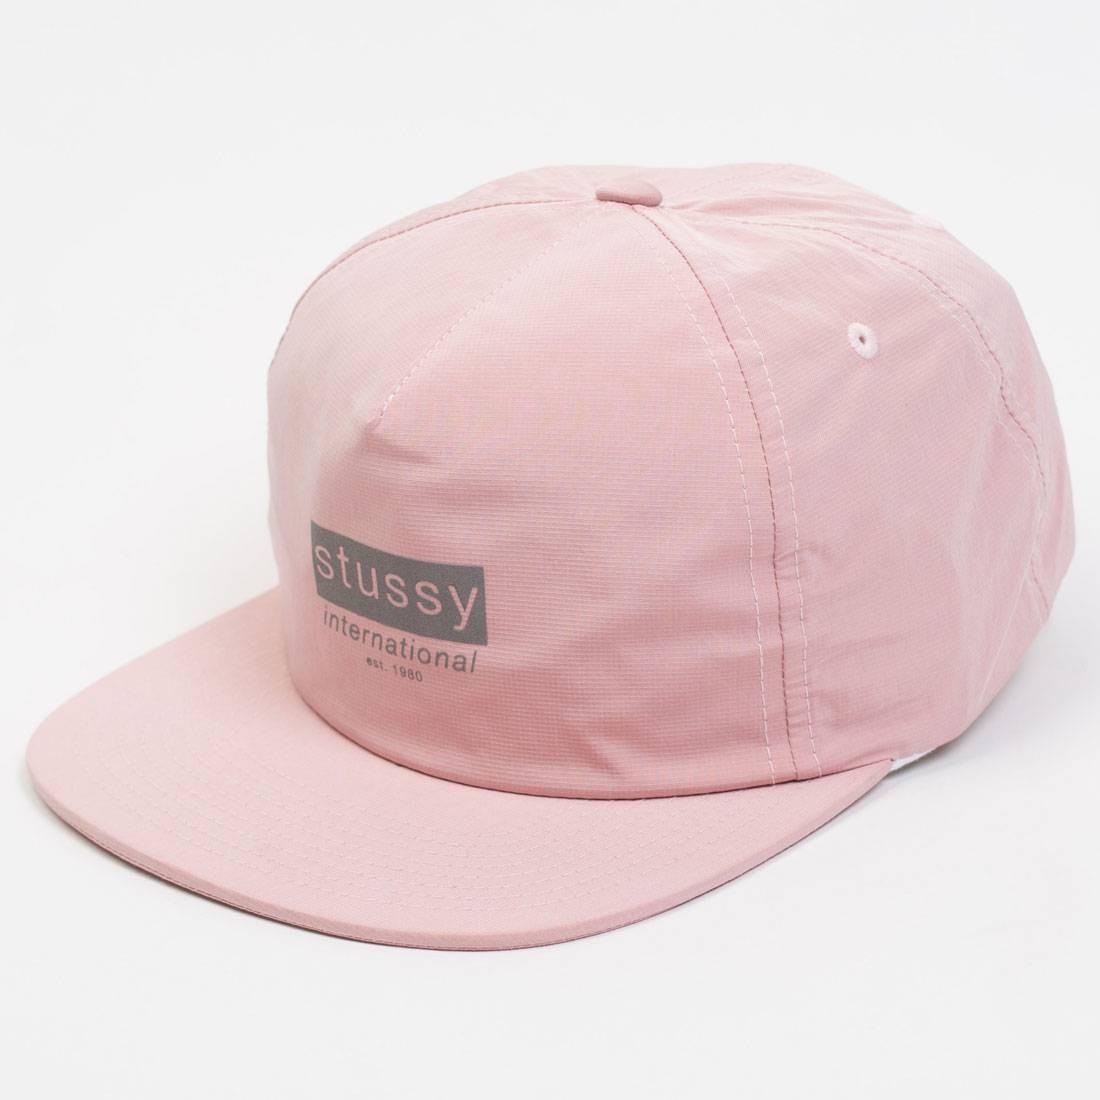 Stussy Reflective Tape Cap (pink) 7113b90185d